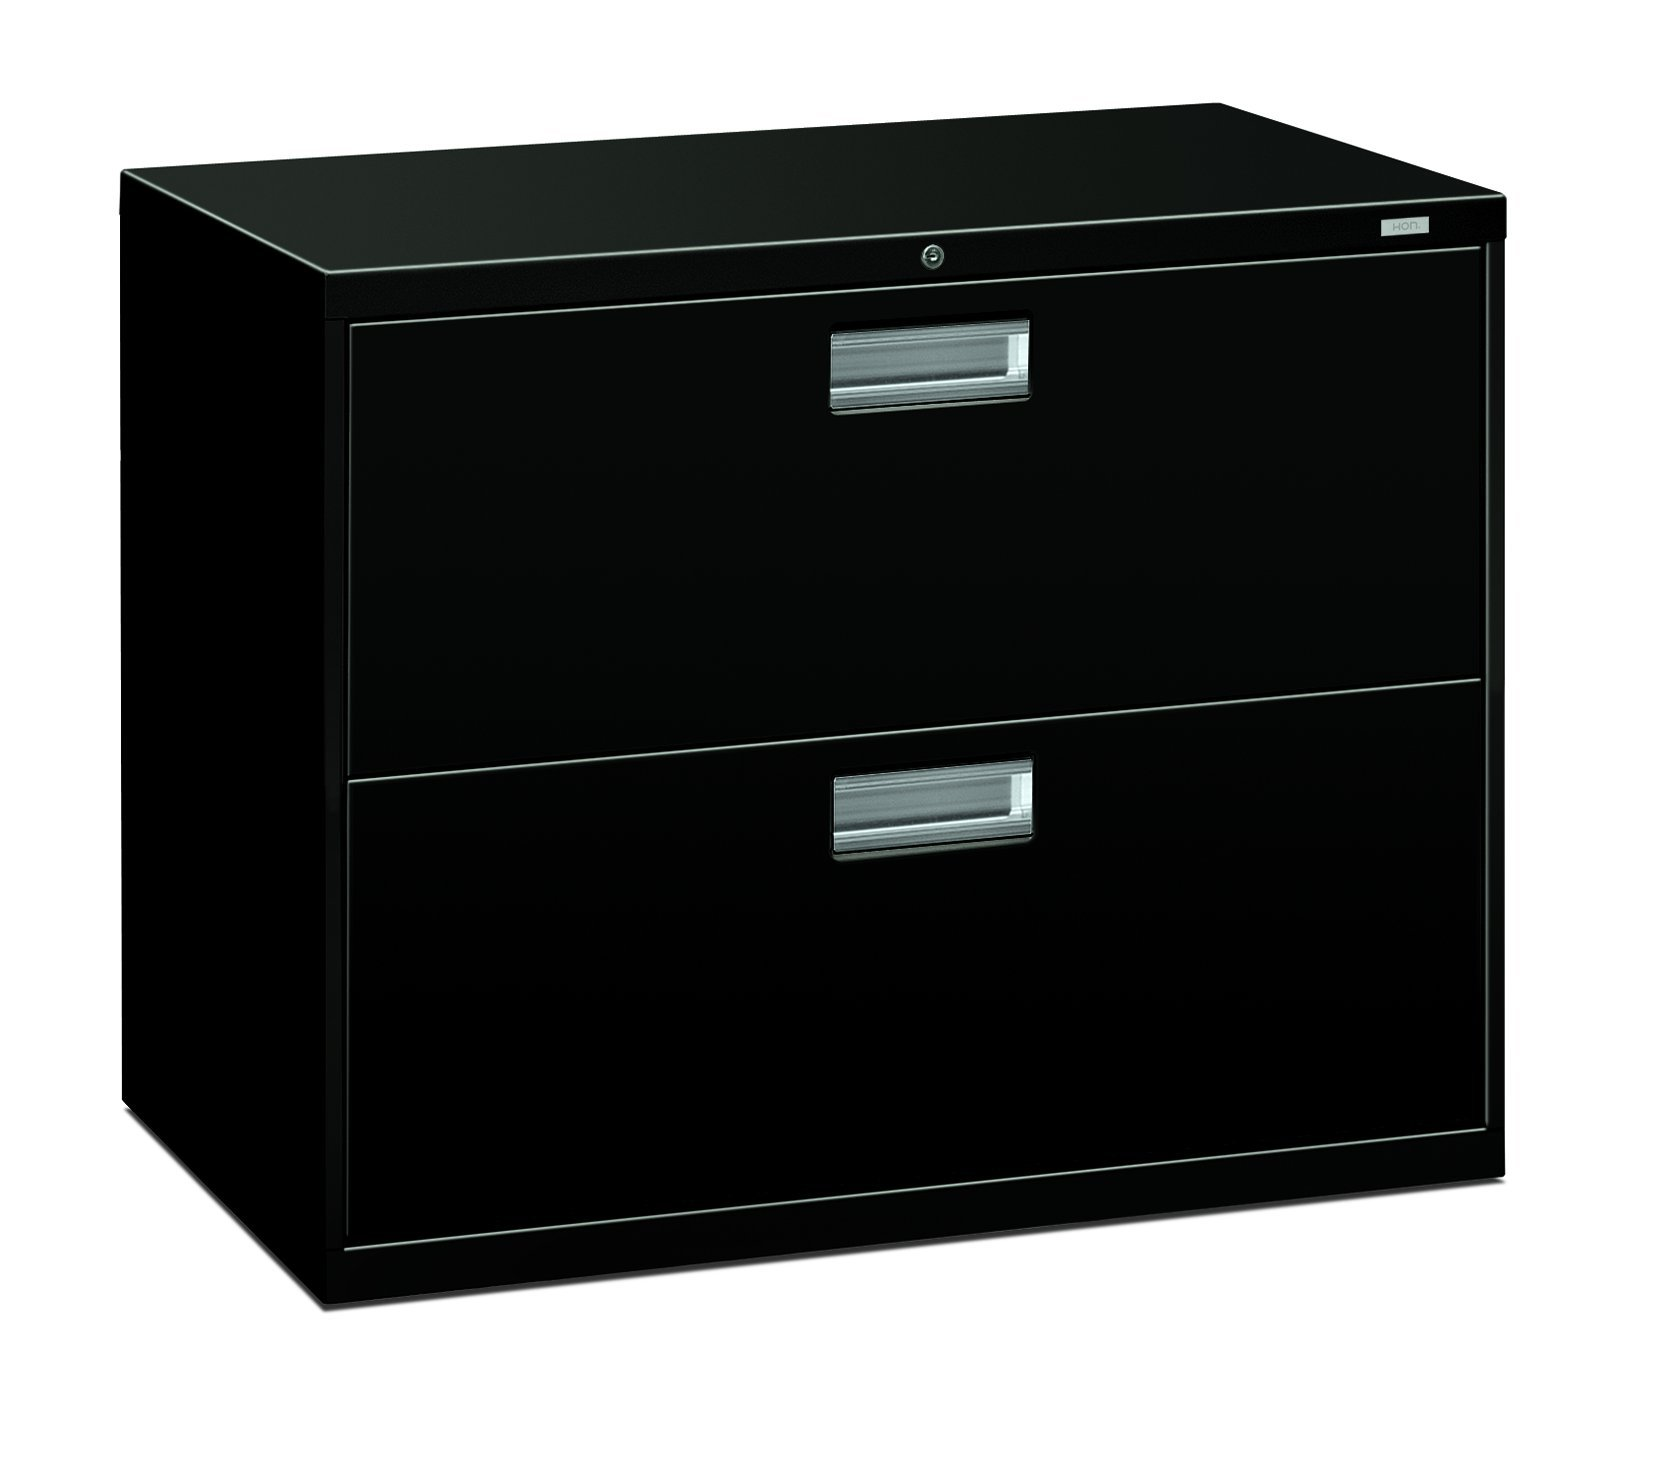 HON 2-Drawer Filing Cabinet - 600 Series Lateral Legal or Letter File Cabinet, Black (H682)